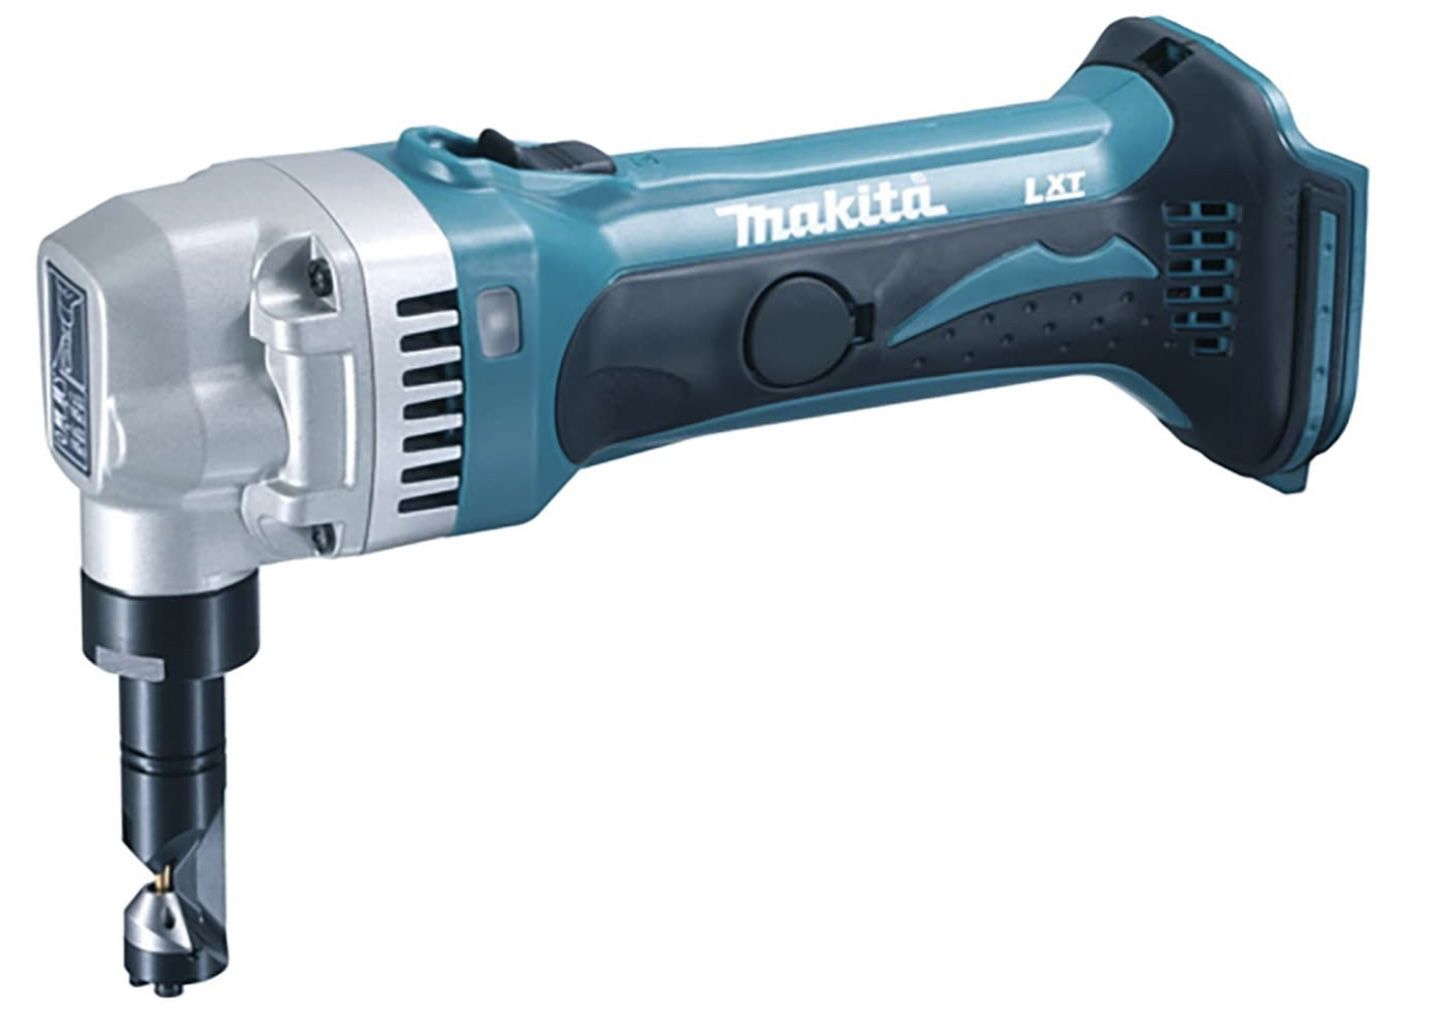 Makita DJN161Z Akku Knabber 1,6mm ohne Akku & ohne Ladegerät für 227,68€ (statt 254€)